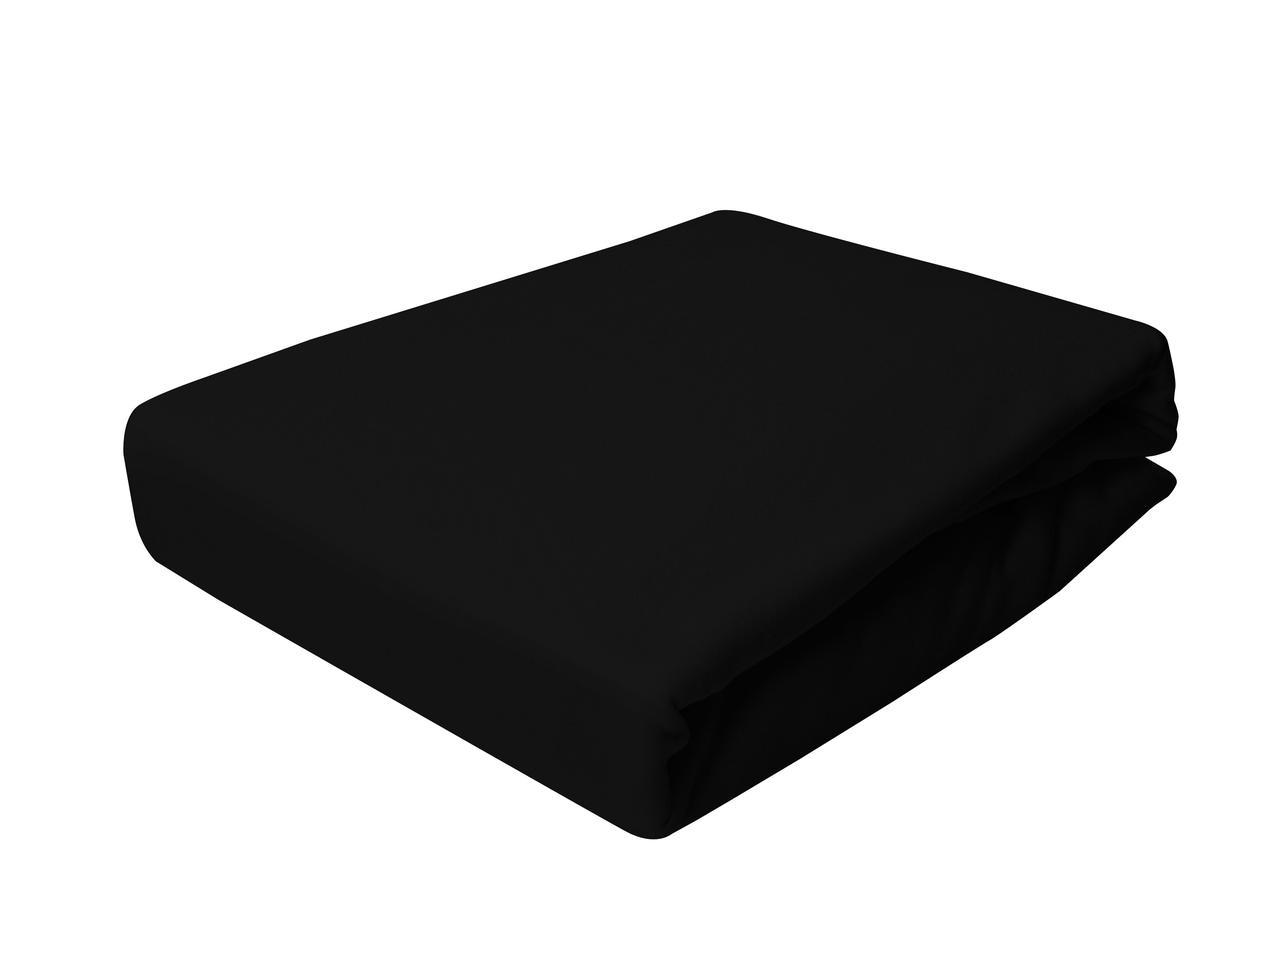 Простыня Трикотажная Без резинки NR 002D Darymex 7002 190x200 см Черная